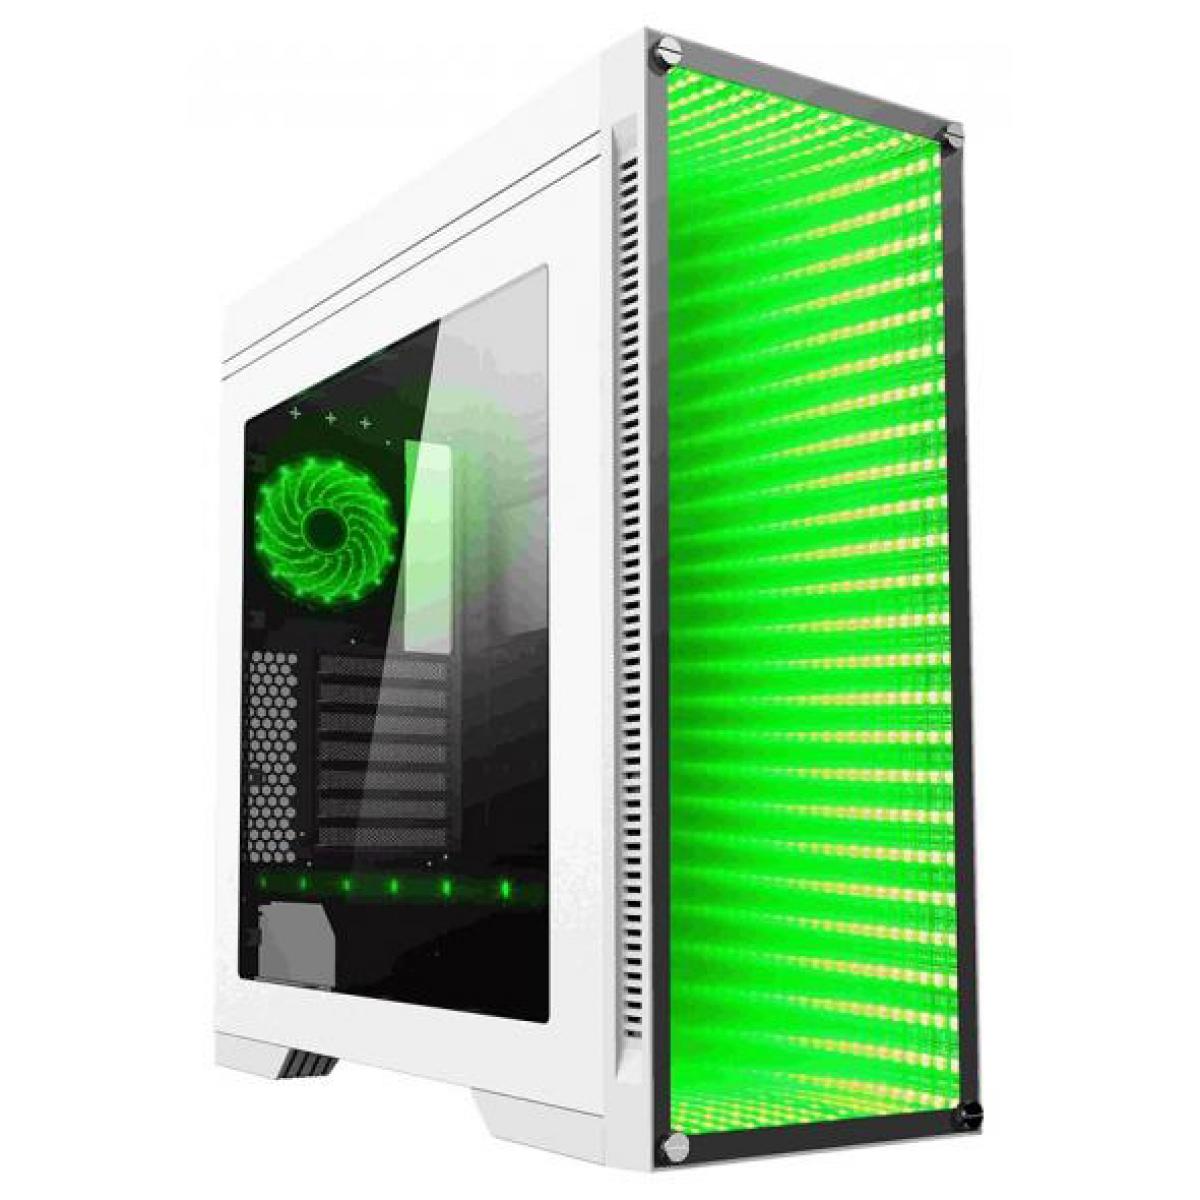 Gabinete Gamer GameMax Infinit M908 RGB, Mid Tower, Com 3 Fans, Lateral em Acrílico, White, Sem Fonte